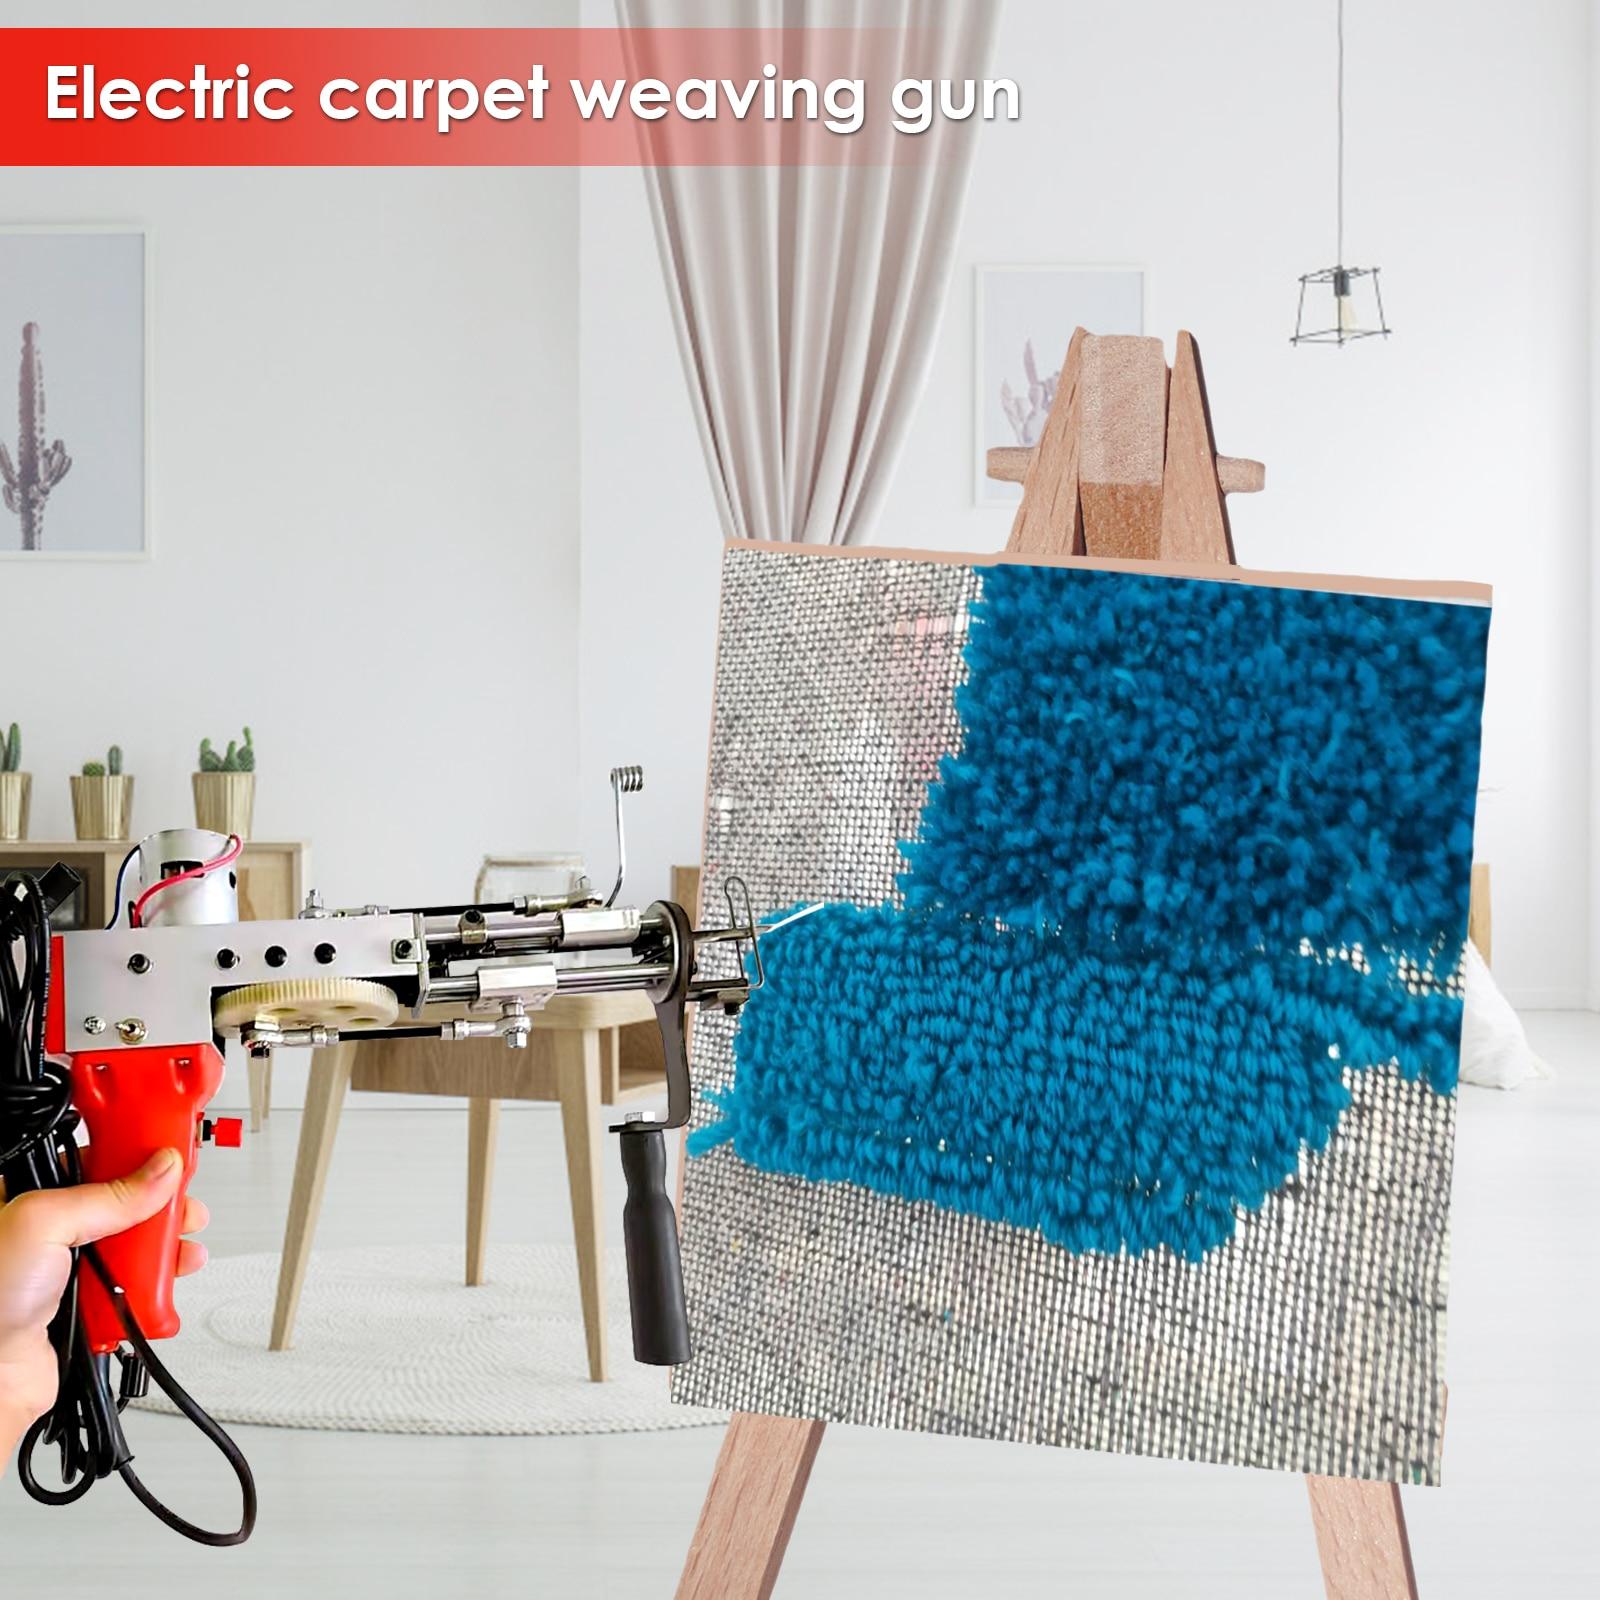 Electric Carpet Tufting Gun Hand Gun Rug Carpet Weaving Flocking Machines Cut Pile All-aluminum Heavy-duty Flocking Machine 110V enlarge